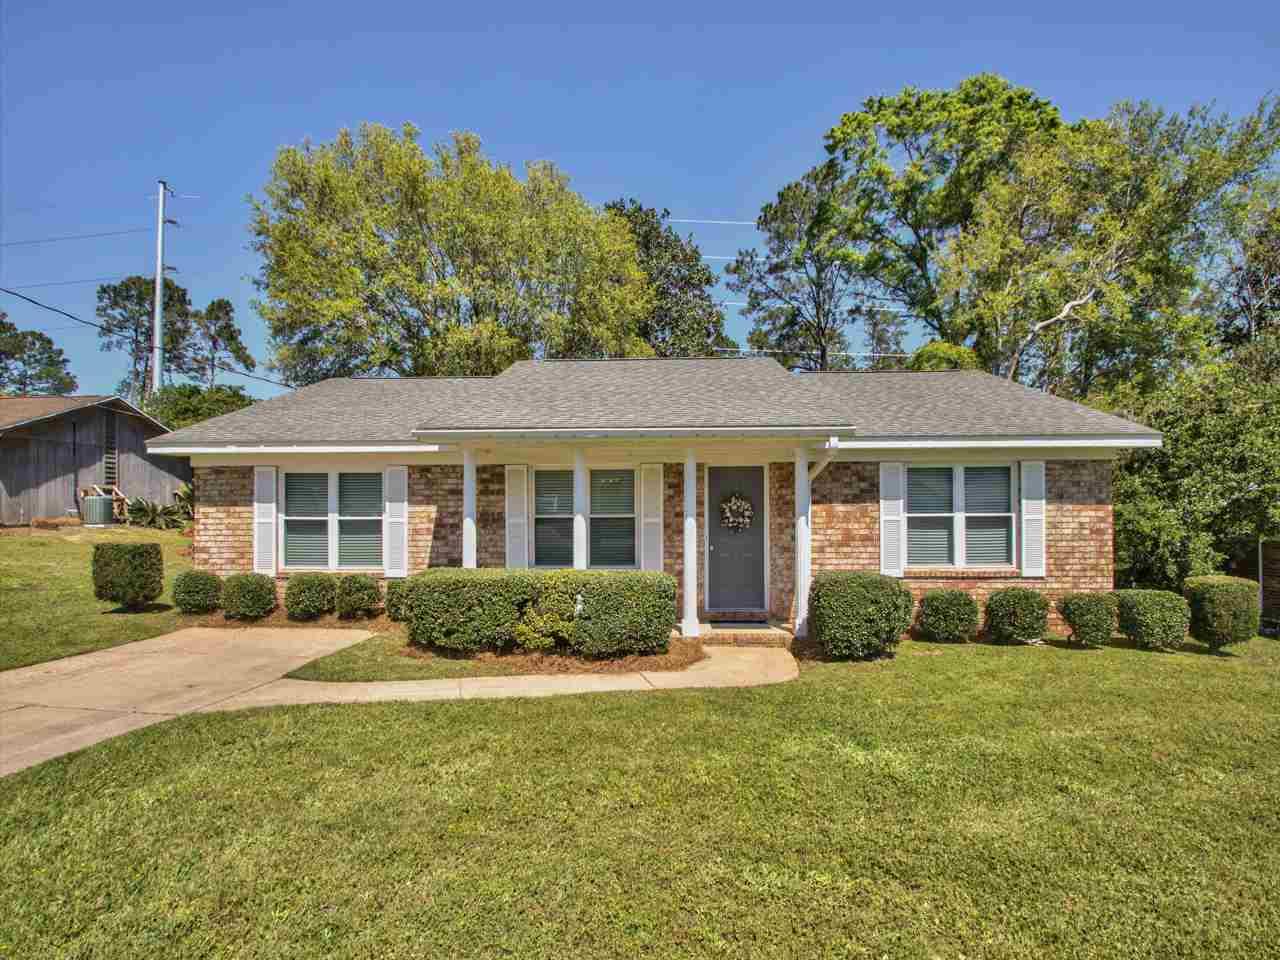 Property ID 304137